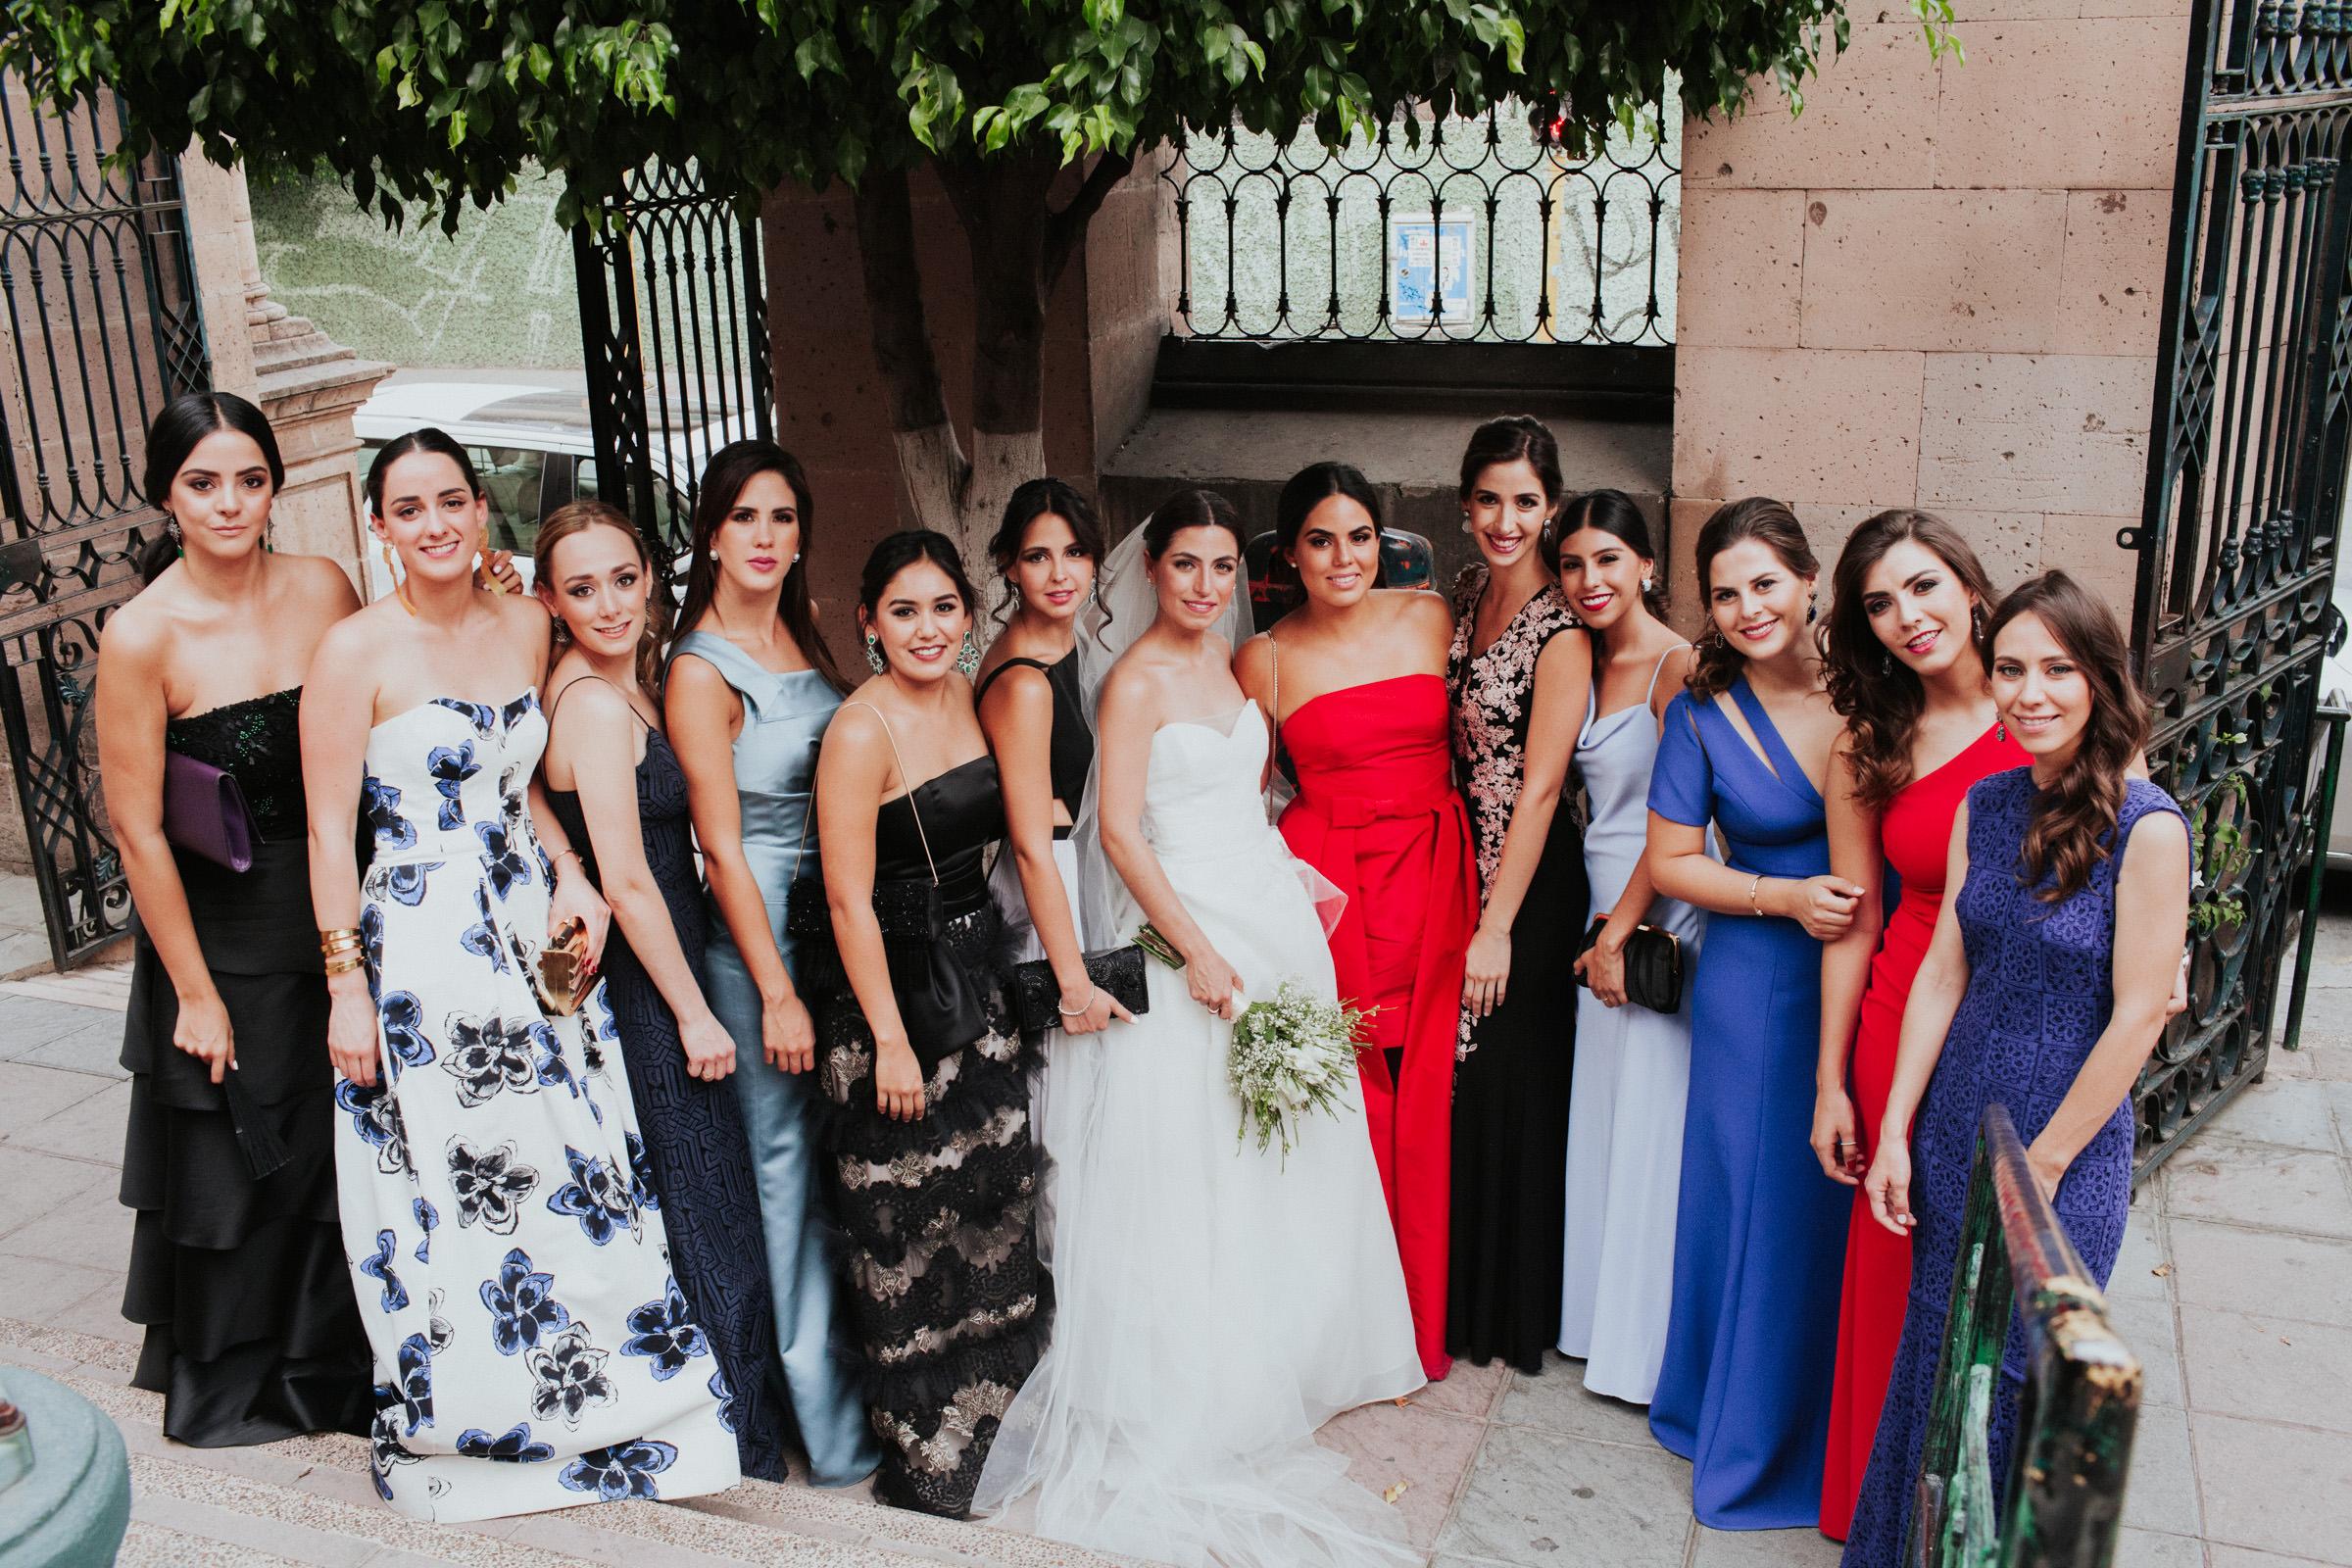 Boda-Leon-Guanajuato-Casa-de-Piedra-Isabella-Daniel-Pierce--128.jpg